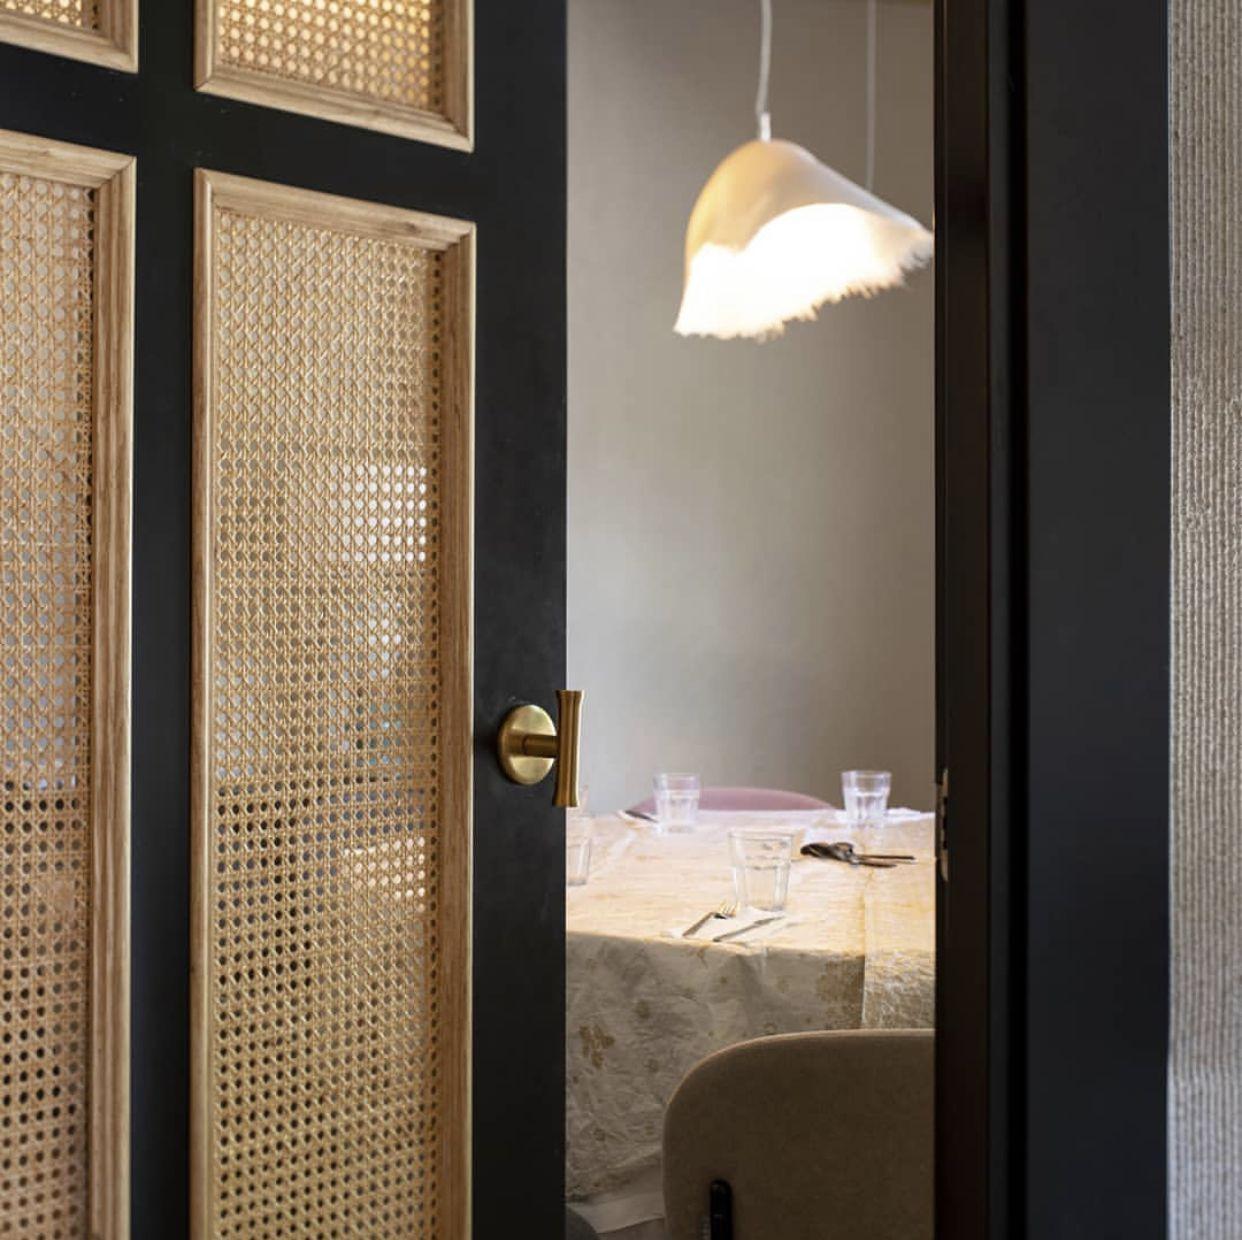 Pin de Super proyectos 123 en Puertas | Puertas